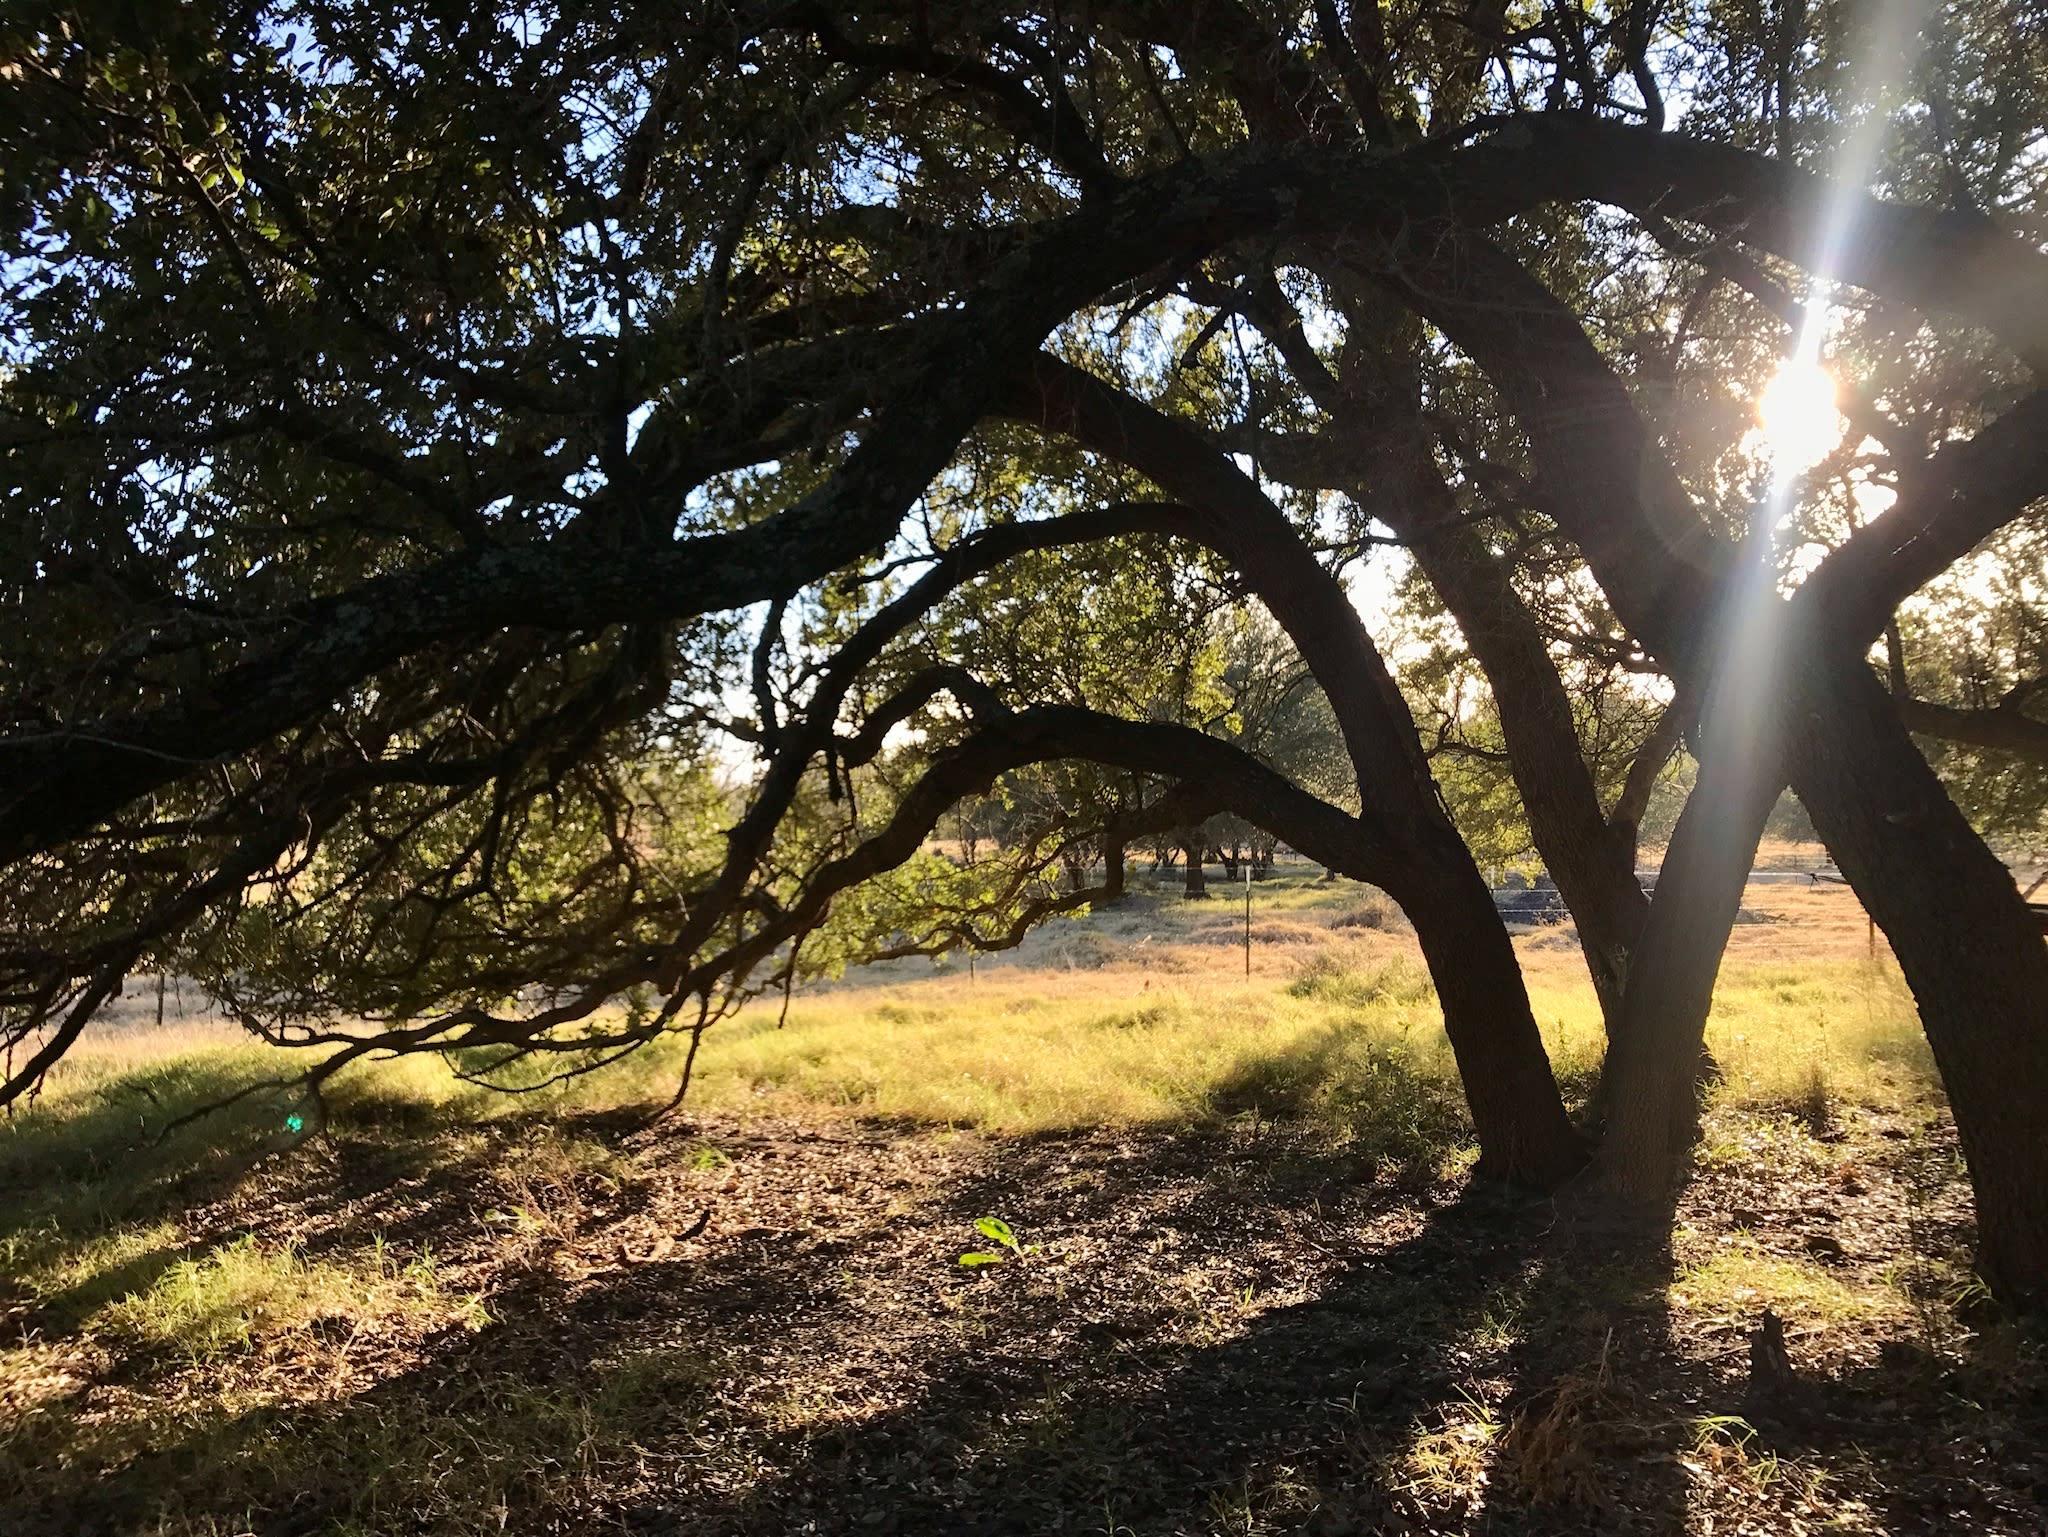 sun coming through oak tree canopy